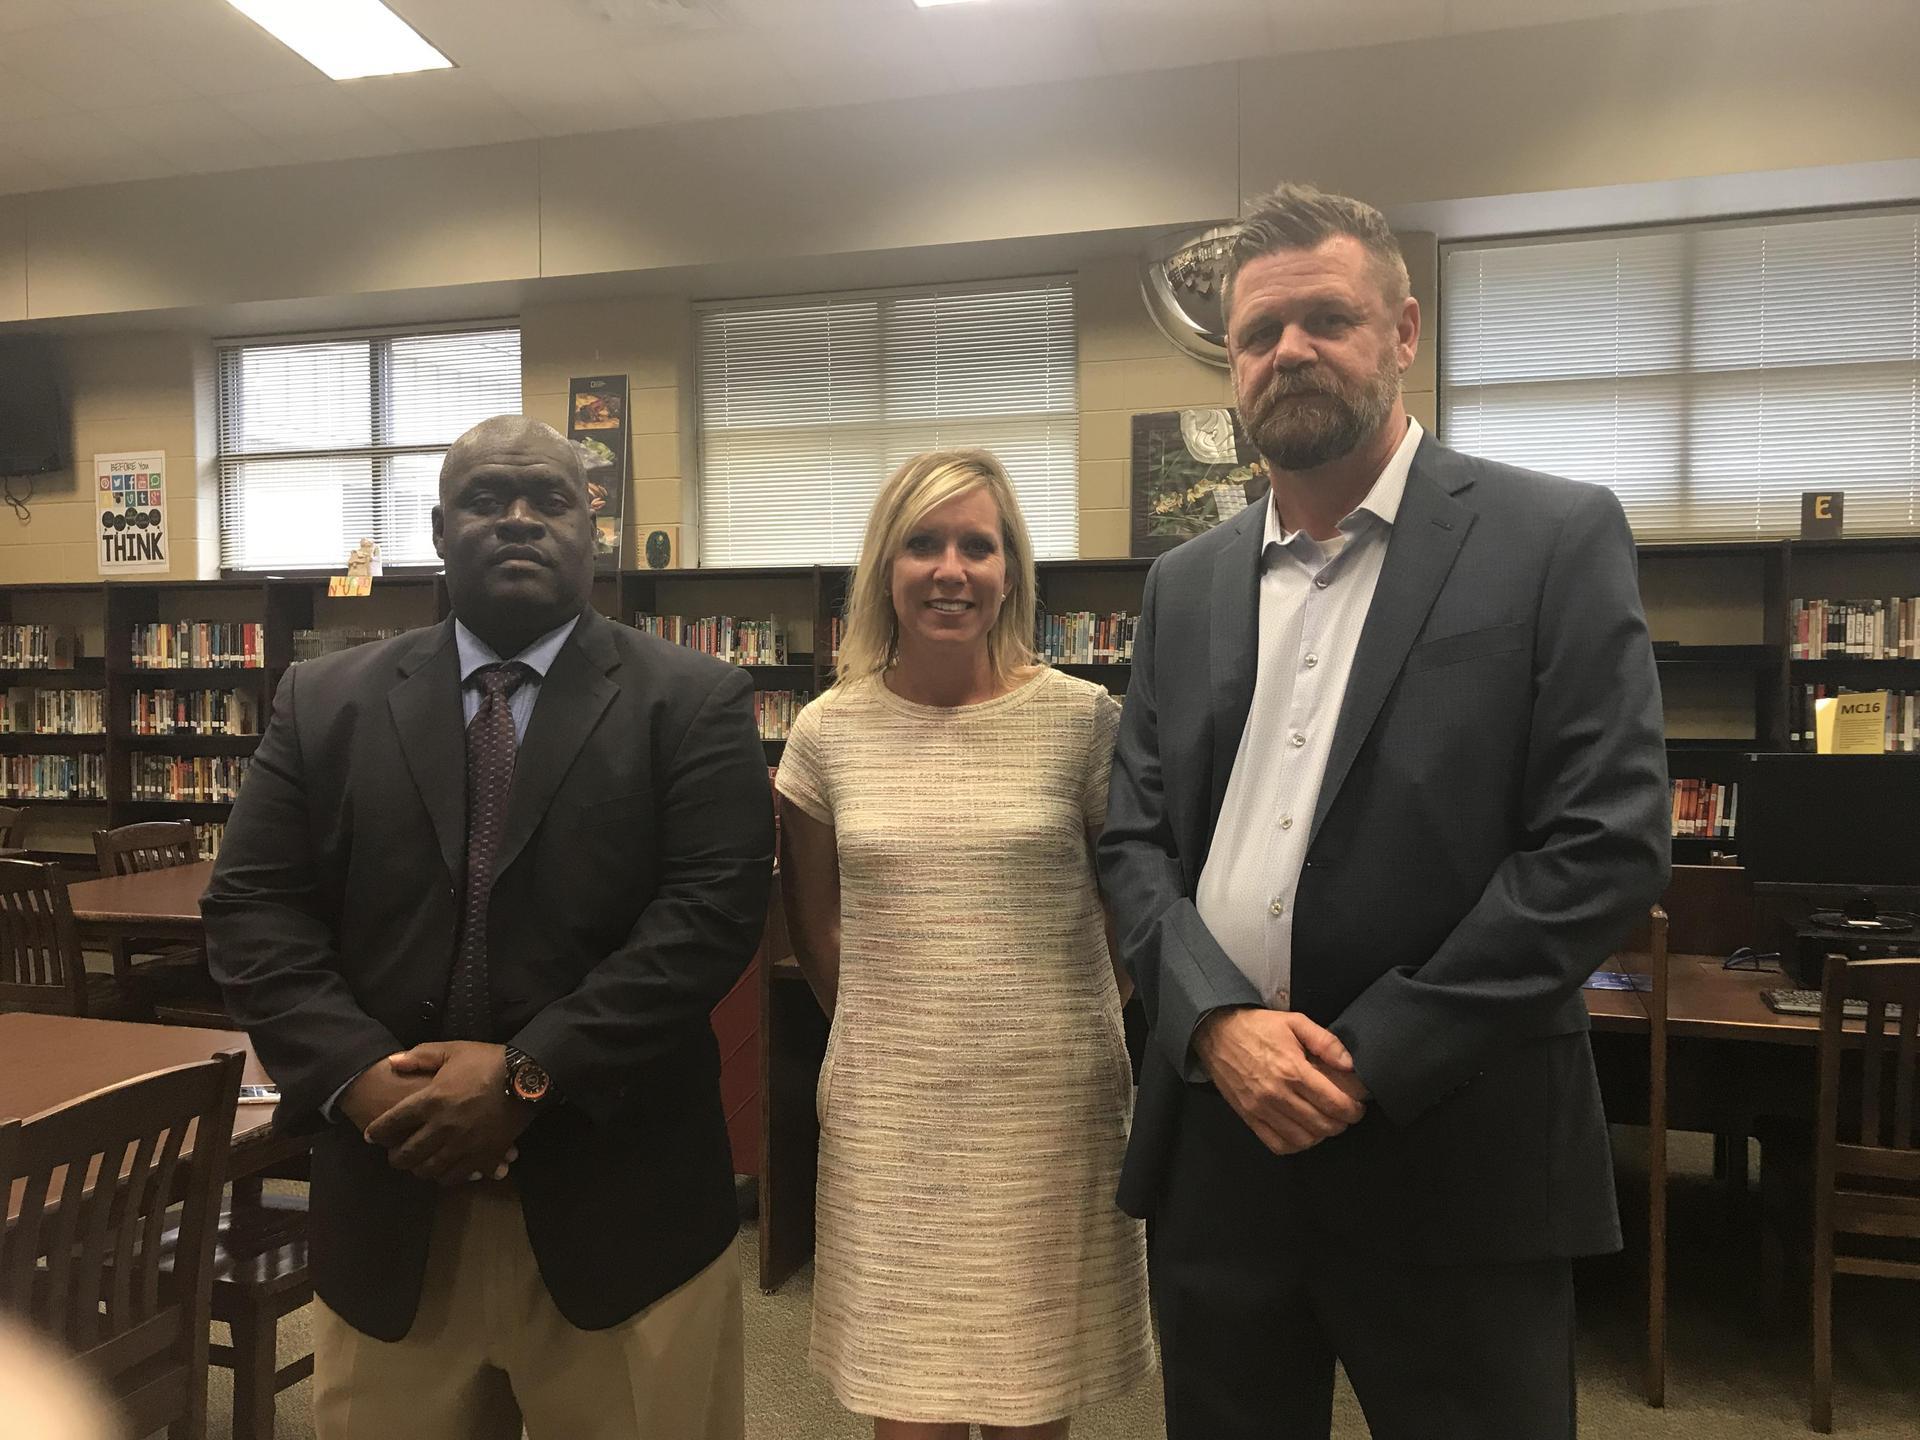 Mr. Brinson, Mrs. Askew and Mr. Joiner